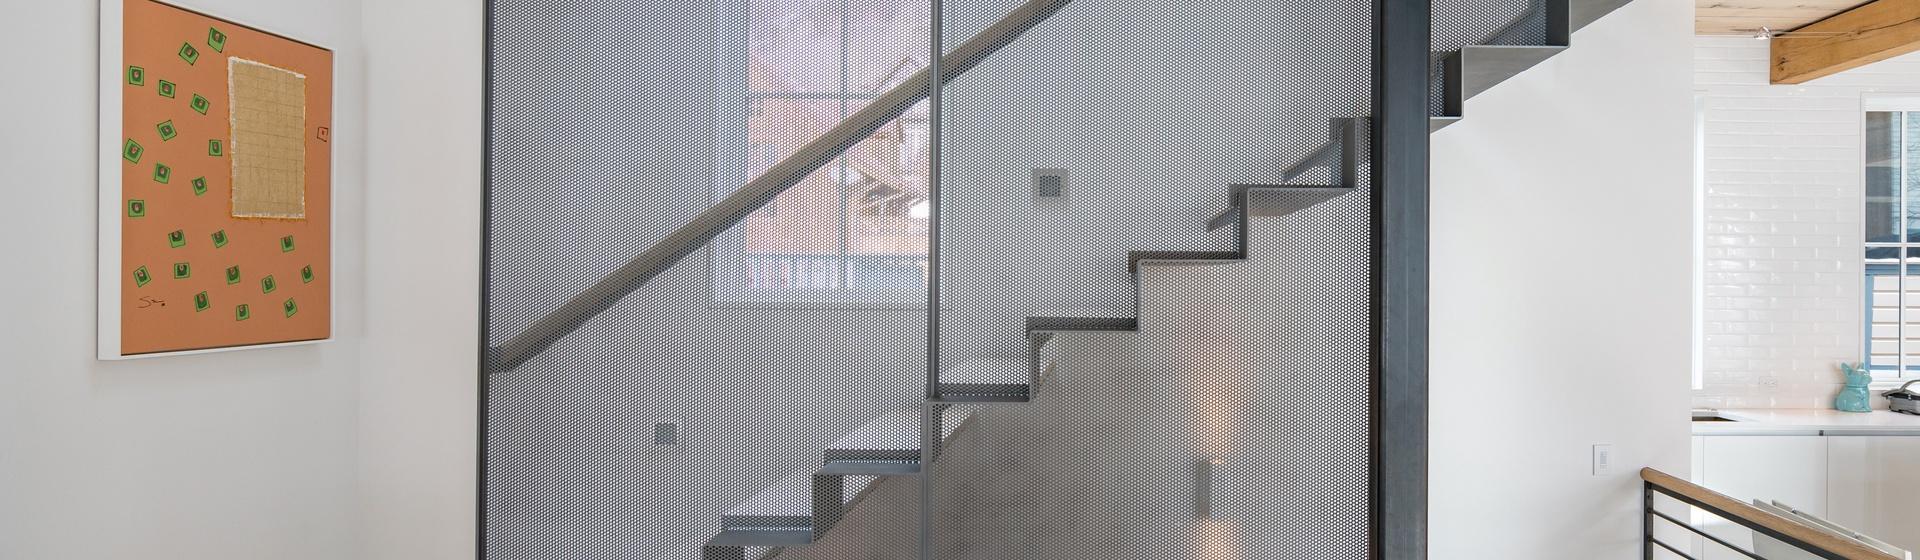 15-Telluride-The-Sunnyside-Stairs-to-Master-Detail-Web.jpg